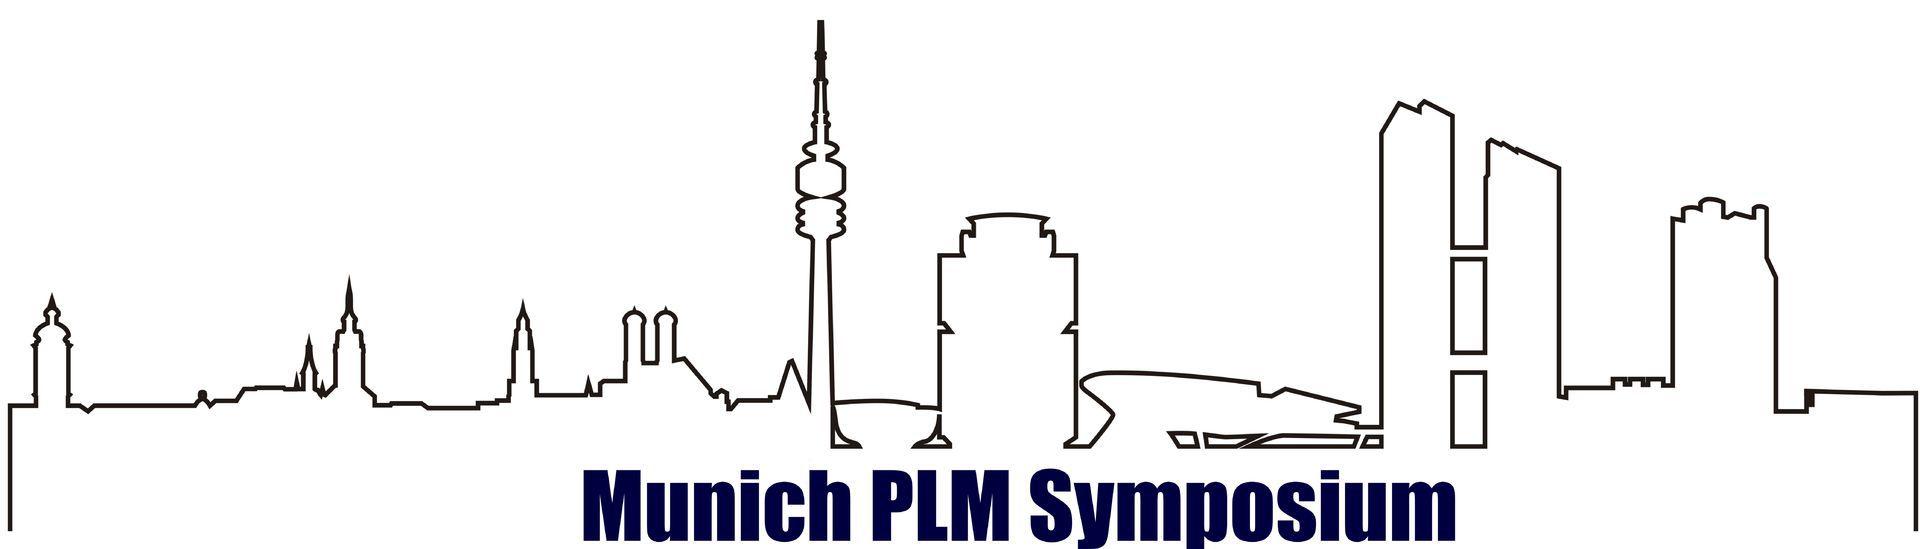 munich-plm